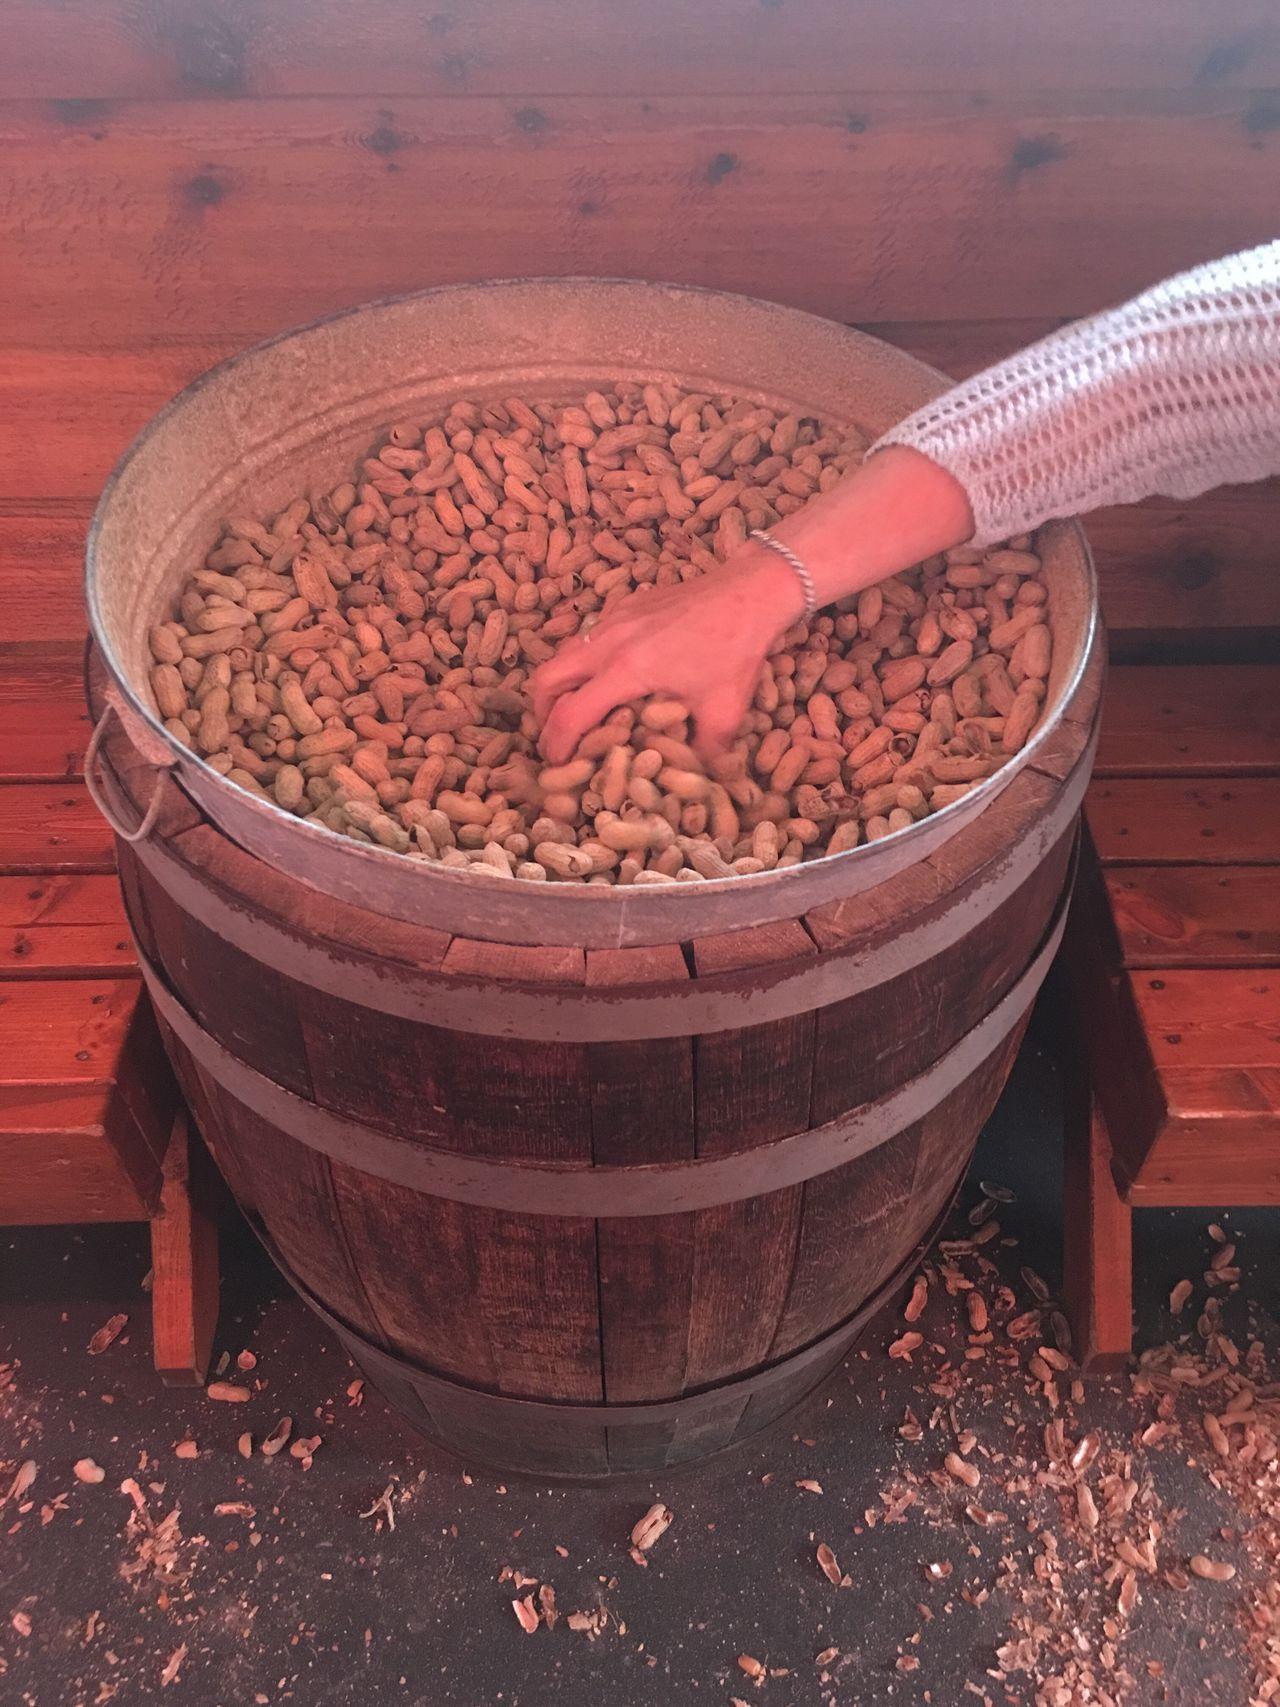 Grabbing Grabbing A Bite Reaching Arm Hand Barrel Peanuts Indoors  Day